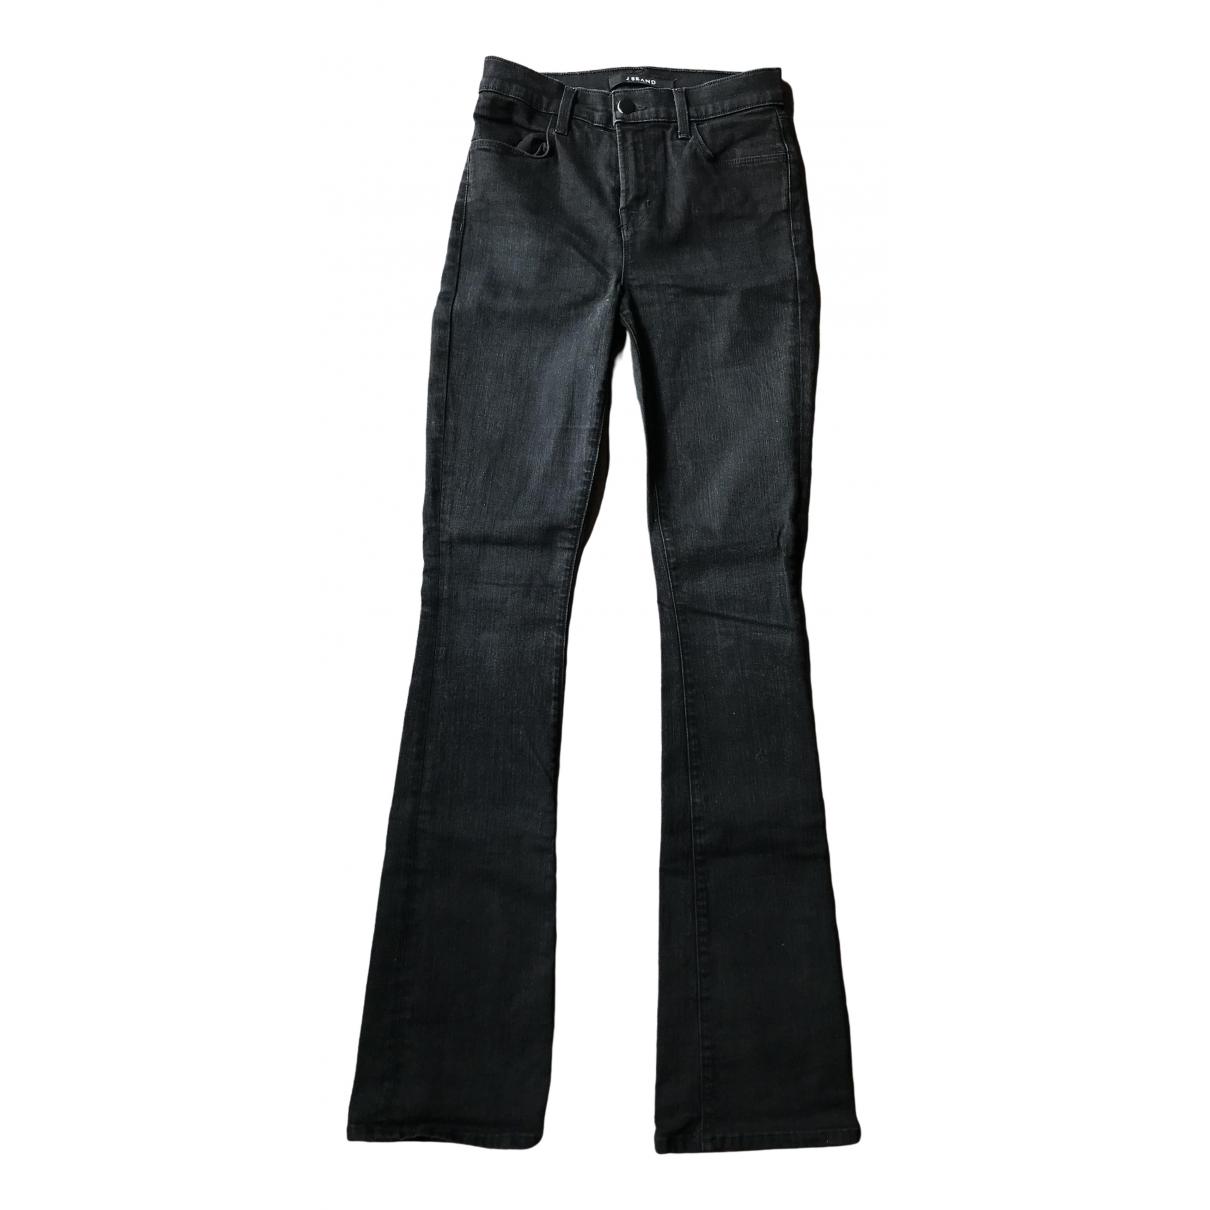 J Brand \N Black Denim - Jeans Trousers for Women XS International